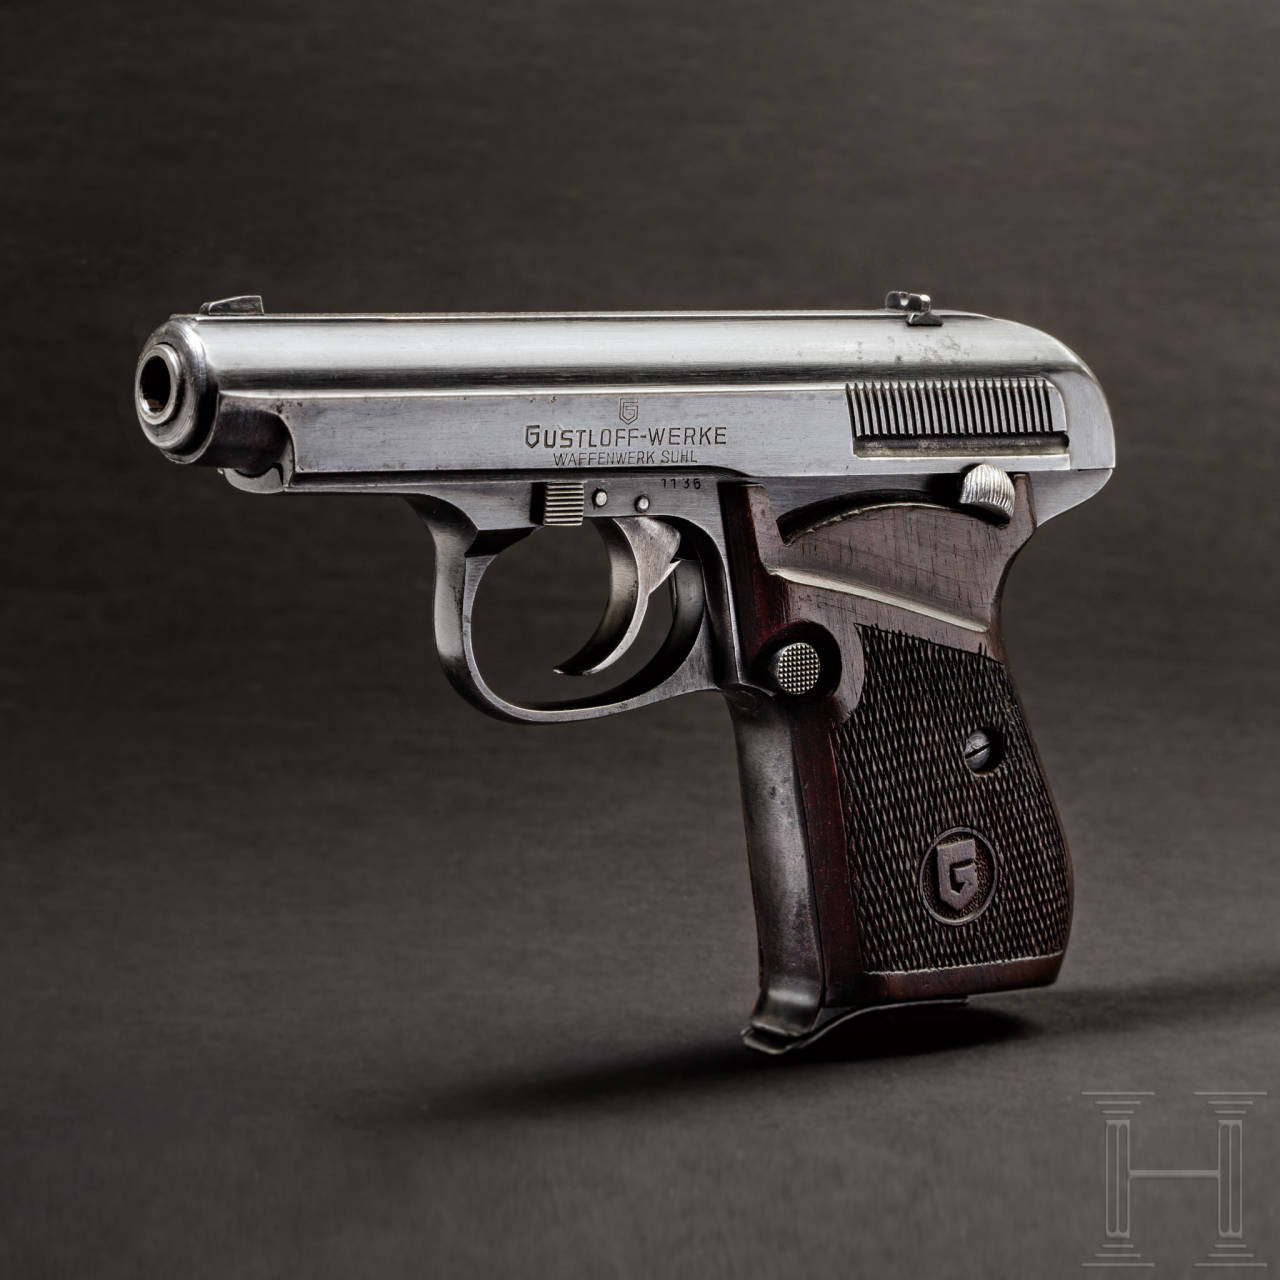 A Gustloff pistol